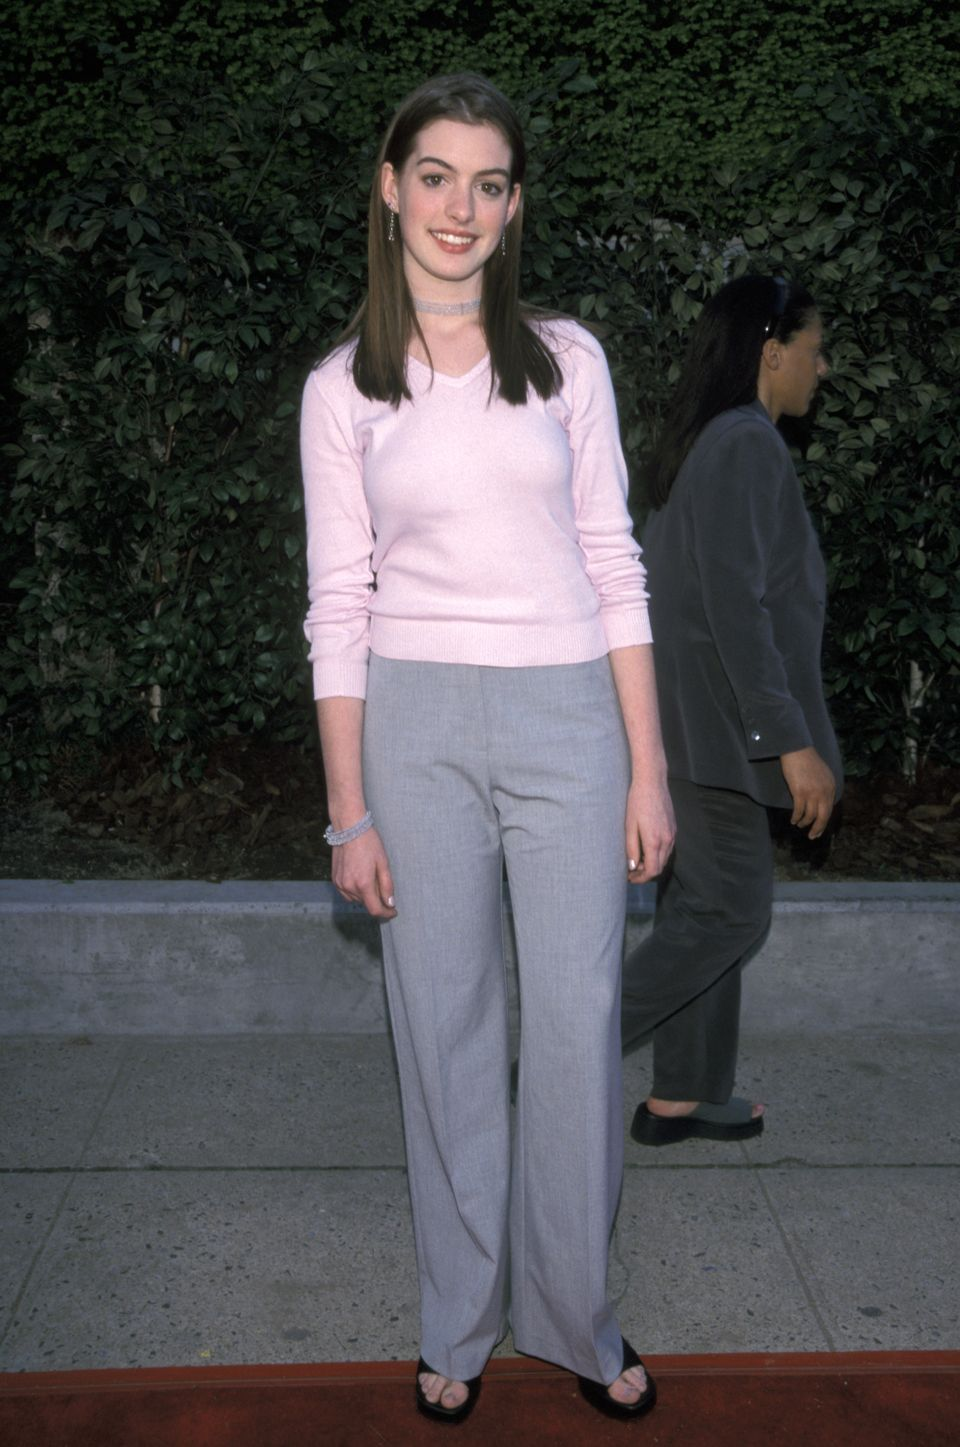 Dress code for wedding garden party - Anne Hathaway Style Evolution